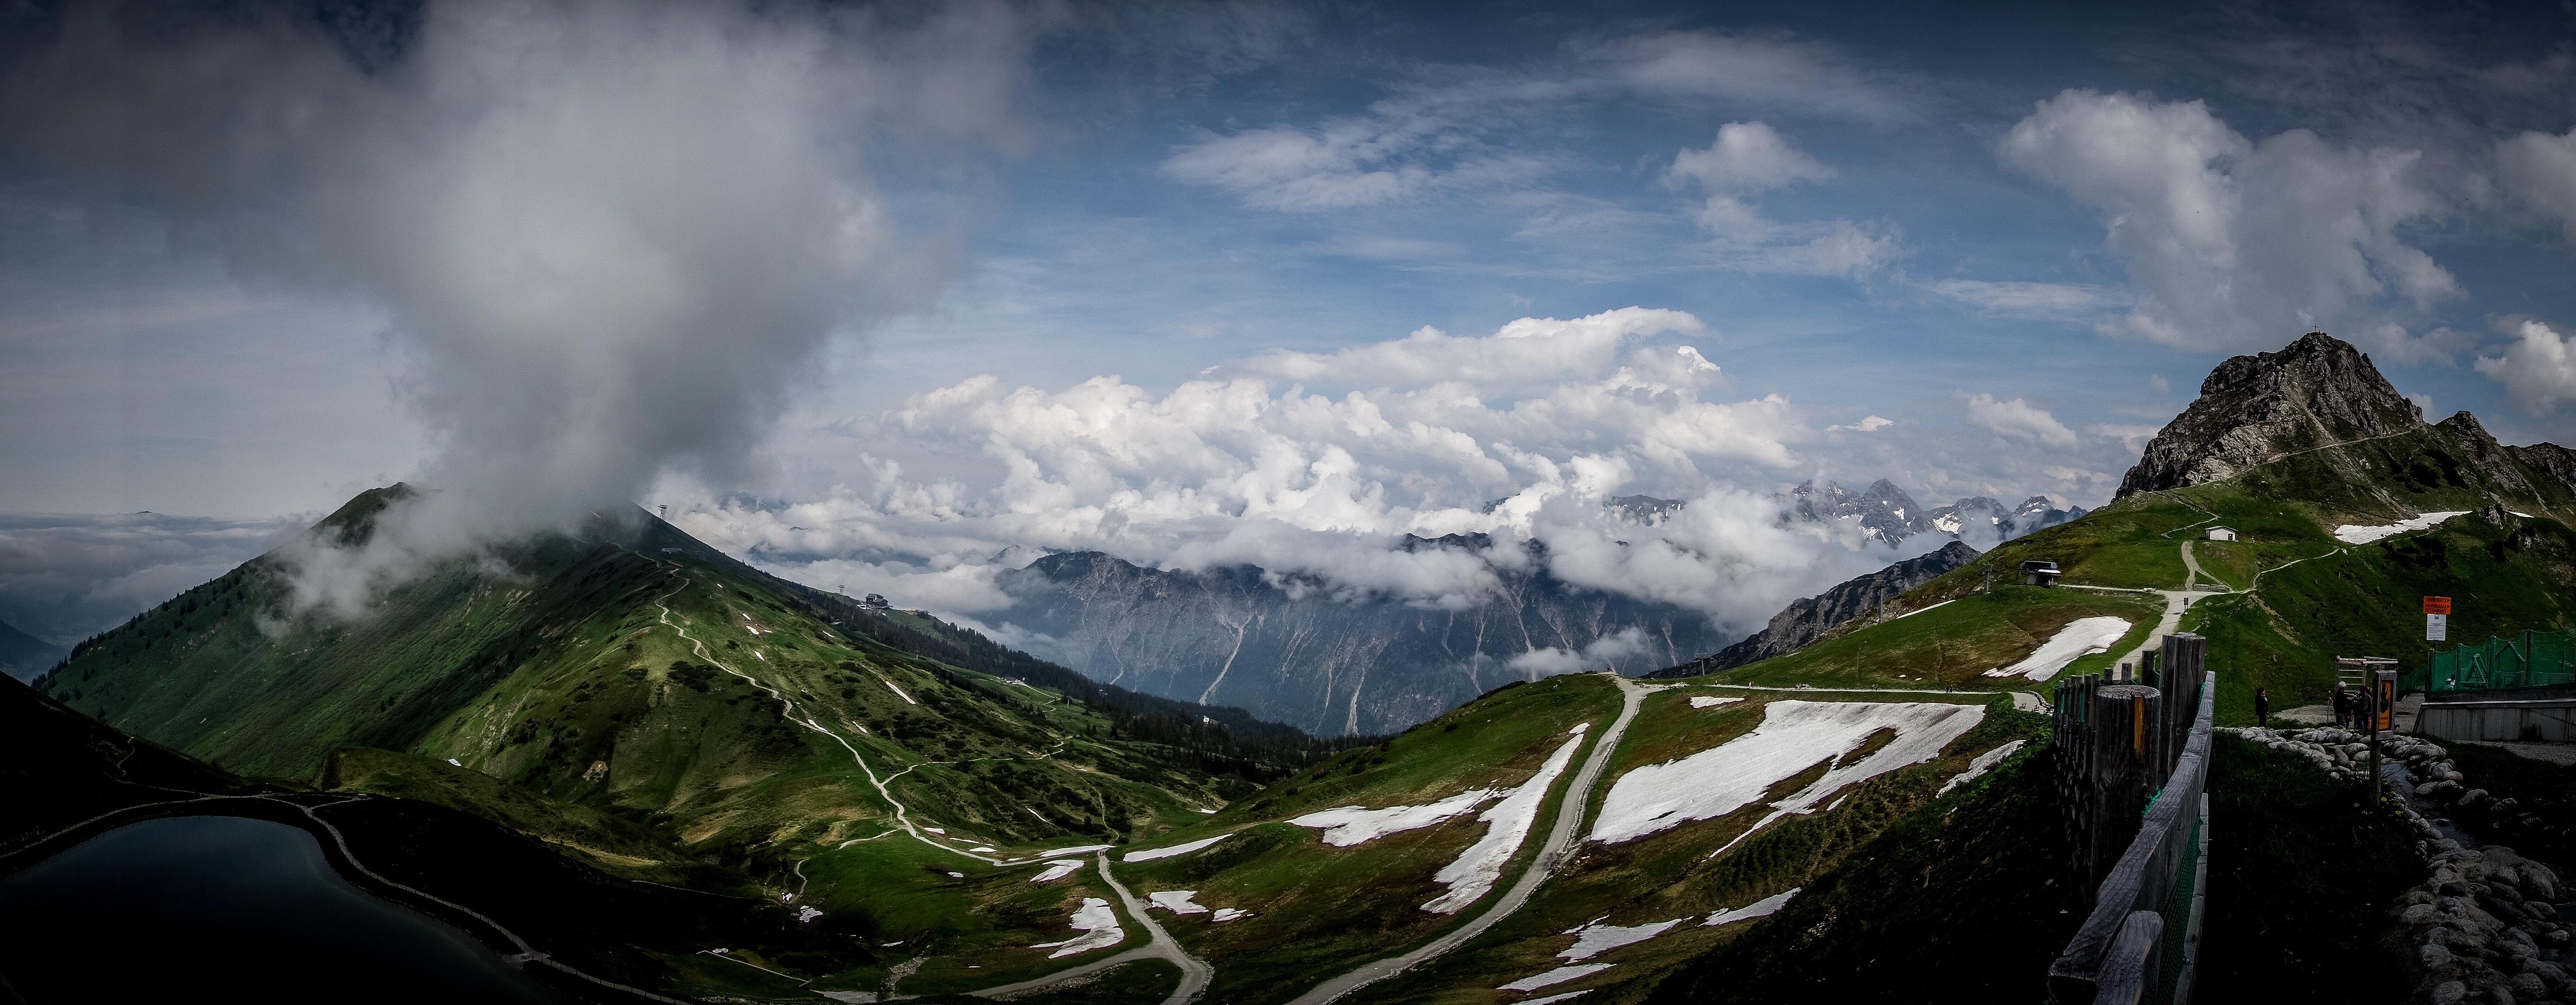 Panoramic view of mountain range photo